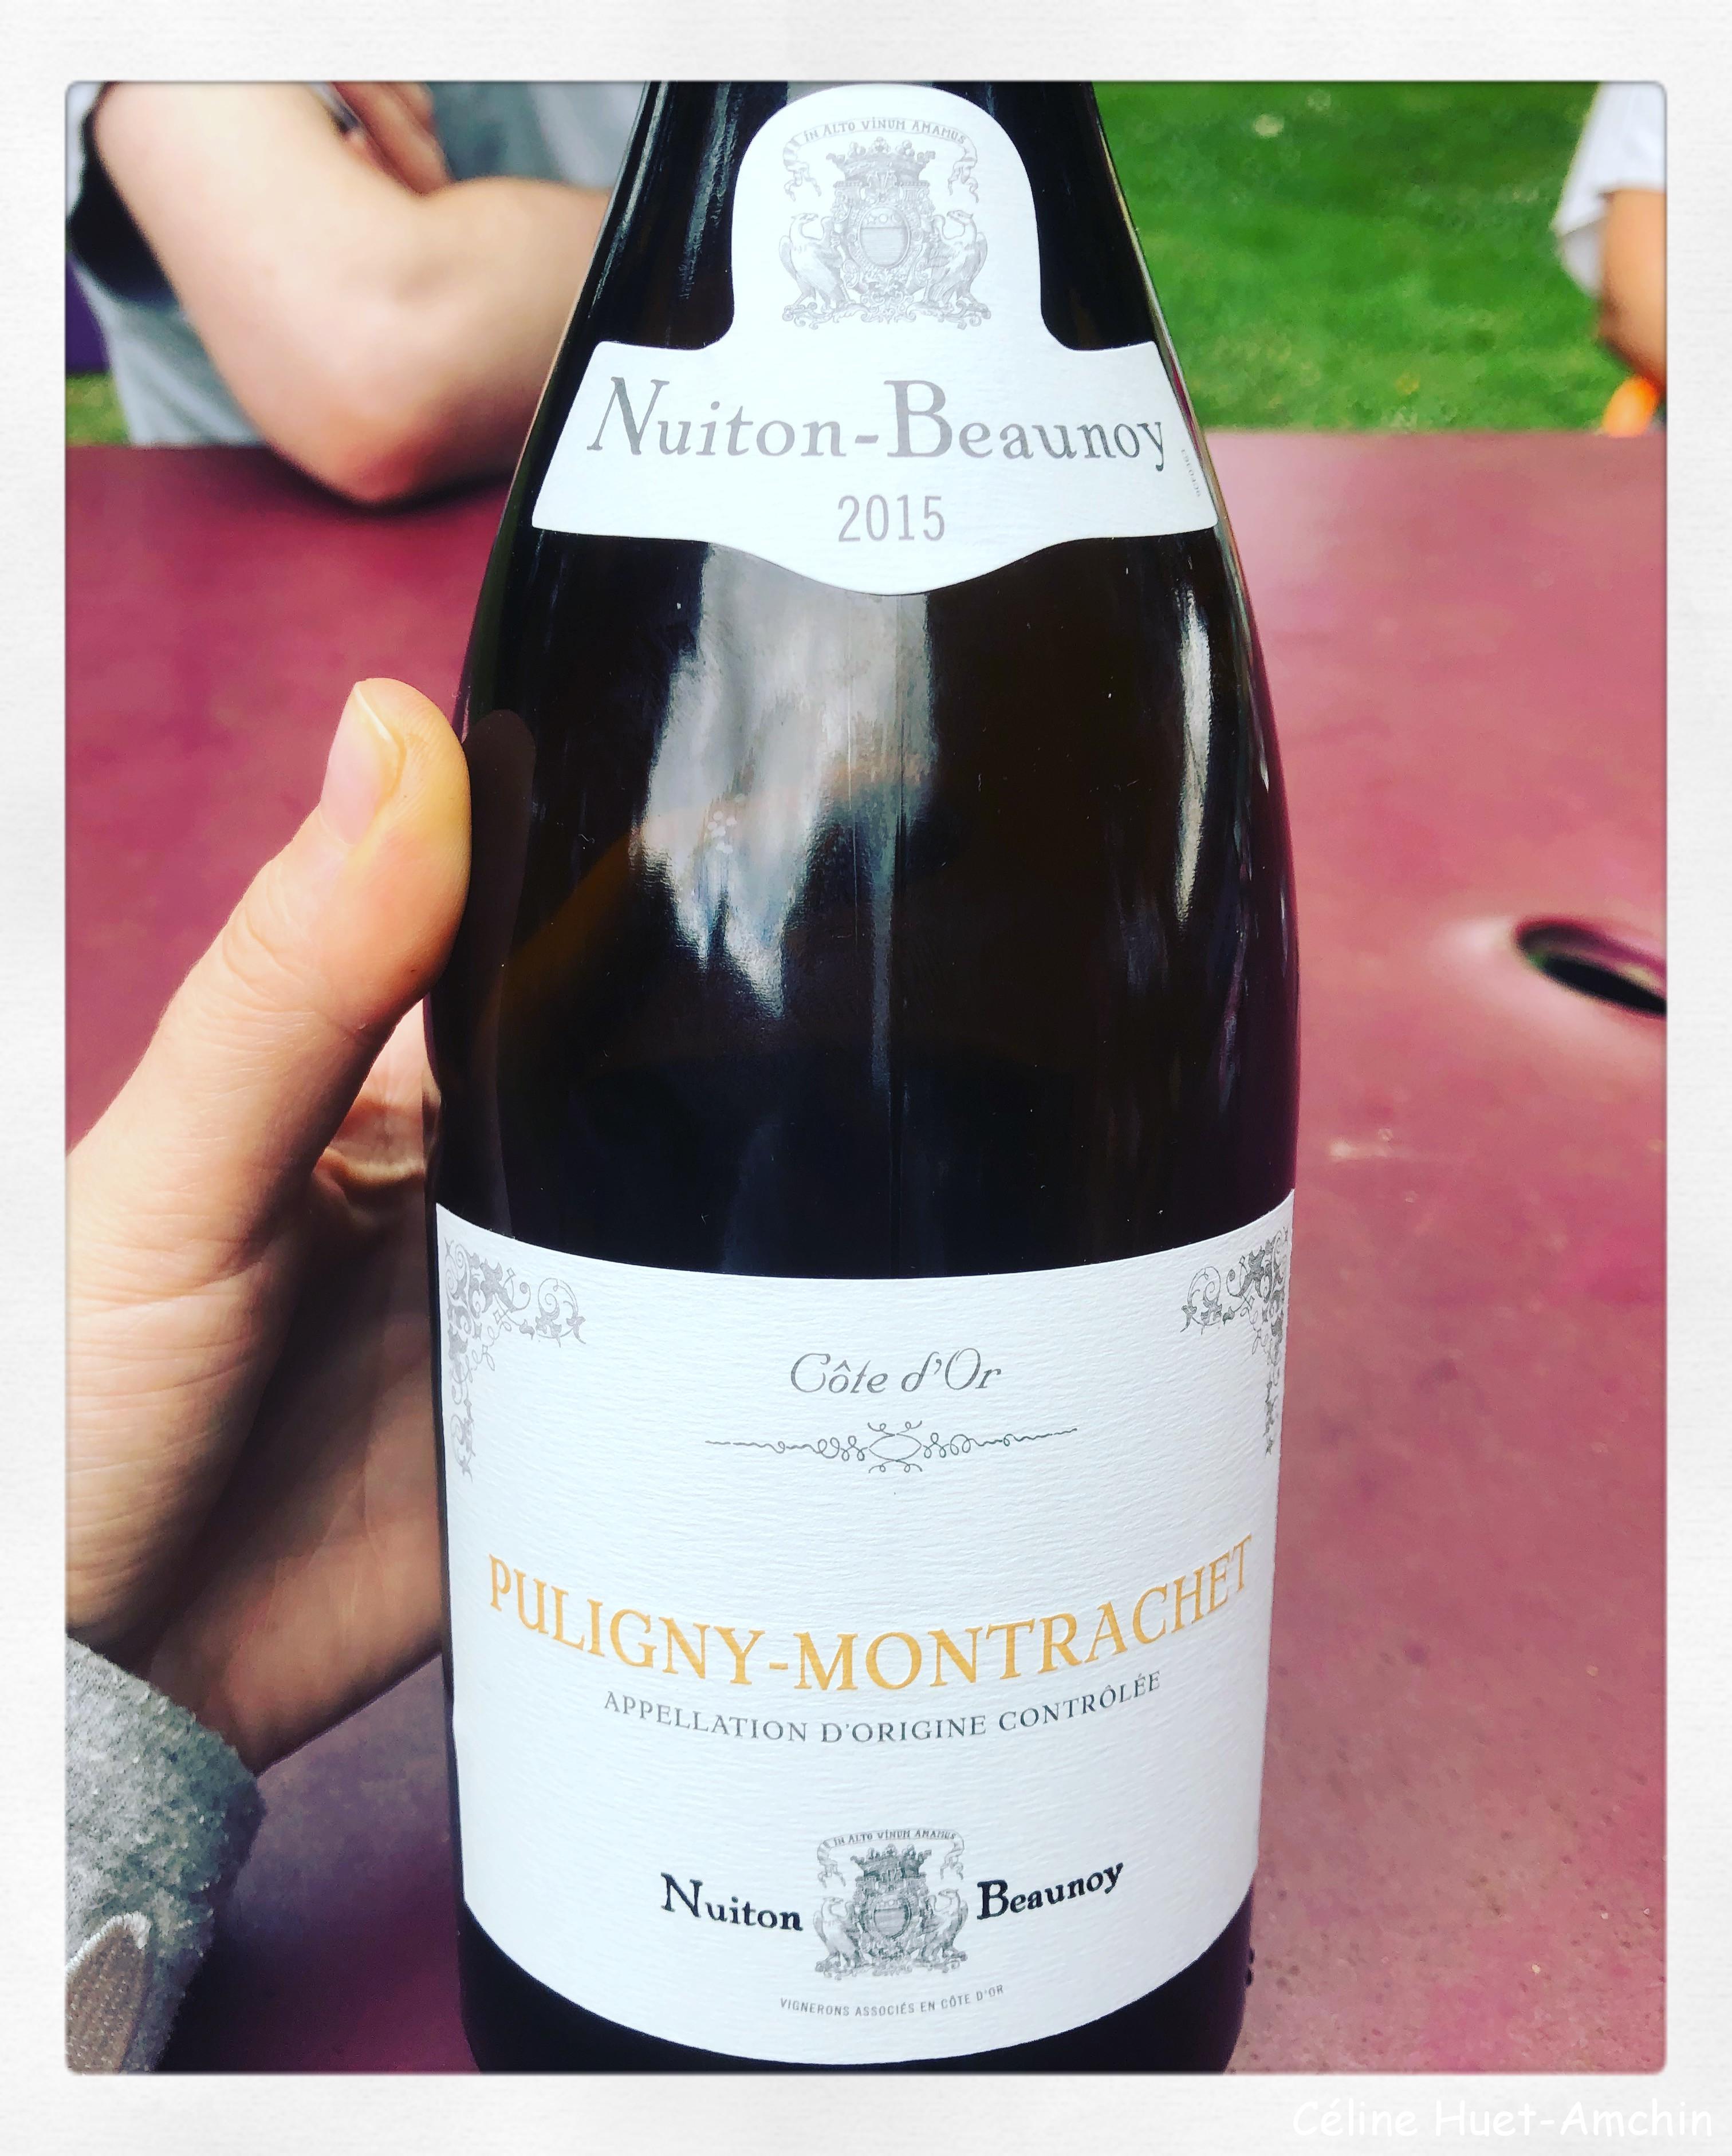 Puligny Montrachet Nuiton-Beaunoy 2015